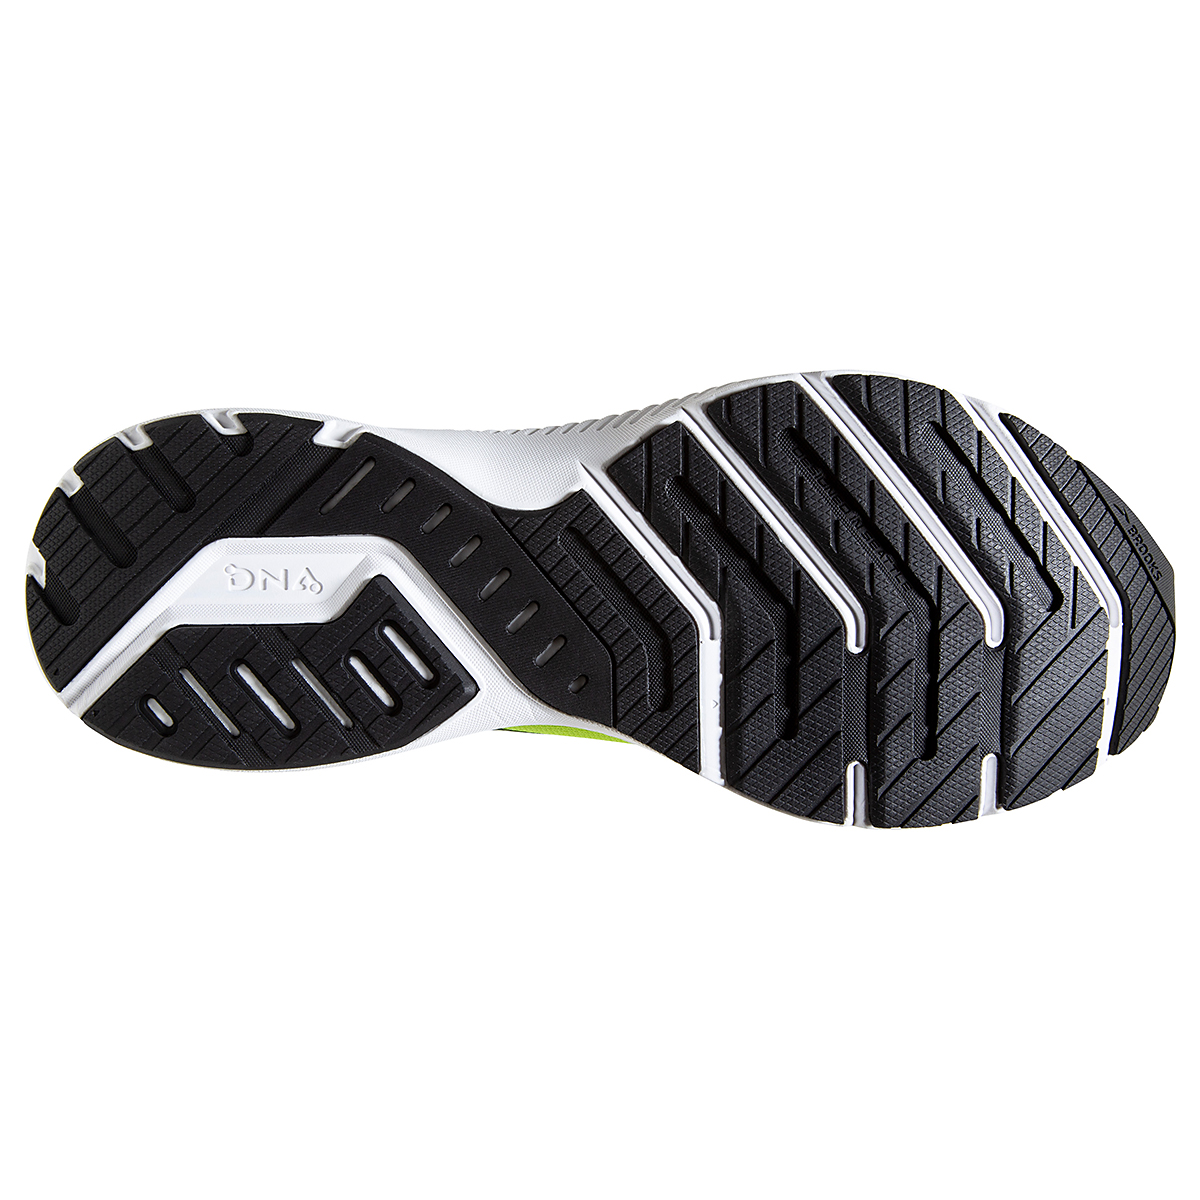 Men's Brooks Launch 8 Running Shoe - Color: Nightlife/Black/White - Size: 7 - Width: Regular, Nightlife/Black/White, large, image 6